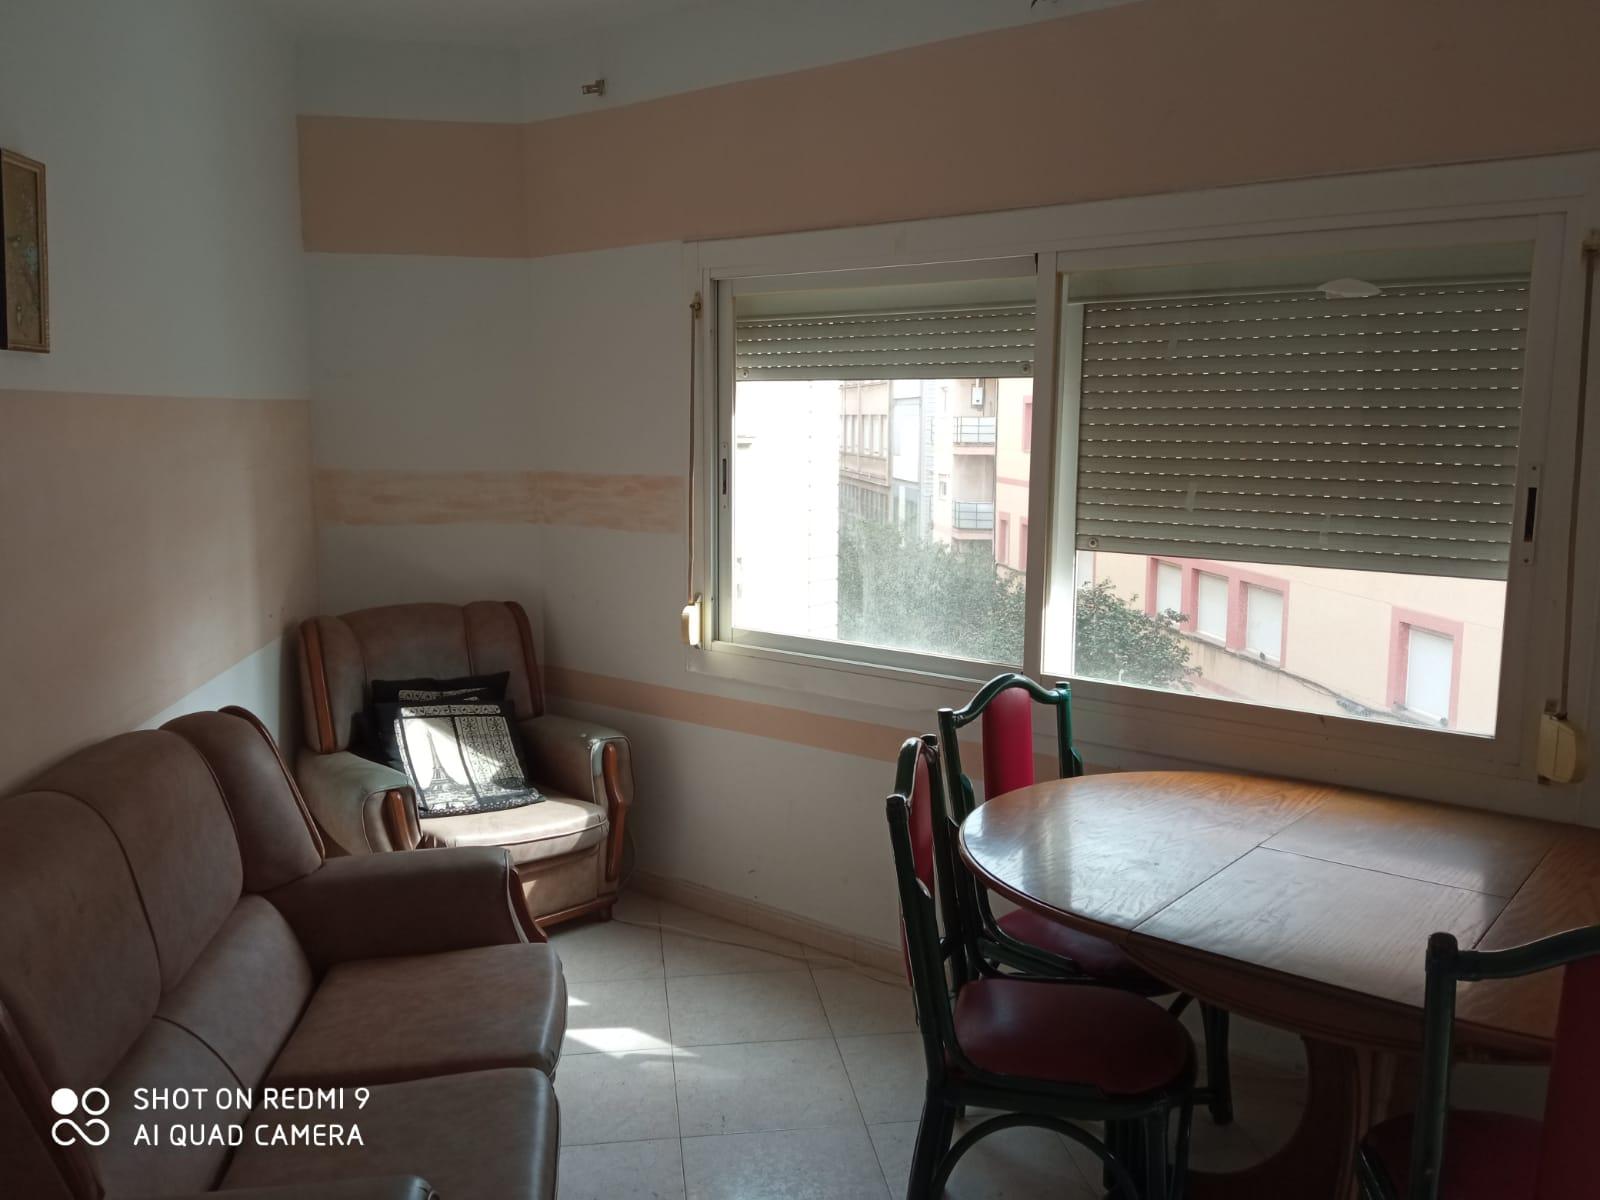 Piso en Torrassa en L'Hospitalet de llobregat en Venta por 131.000€